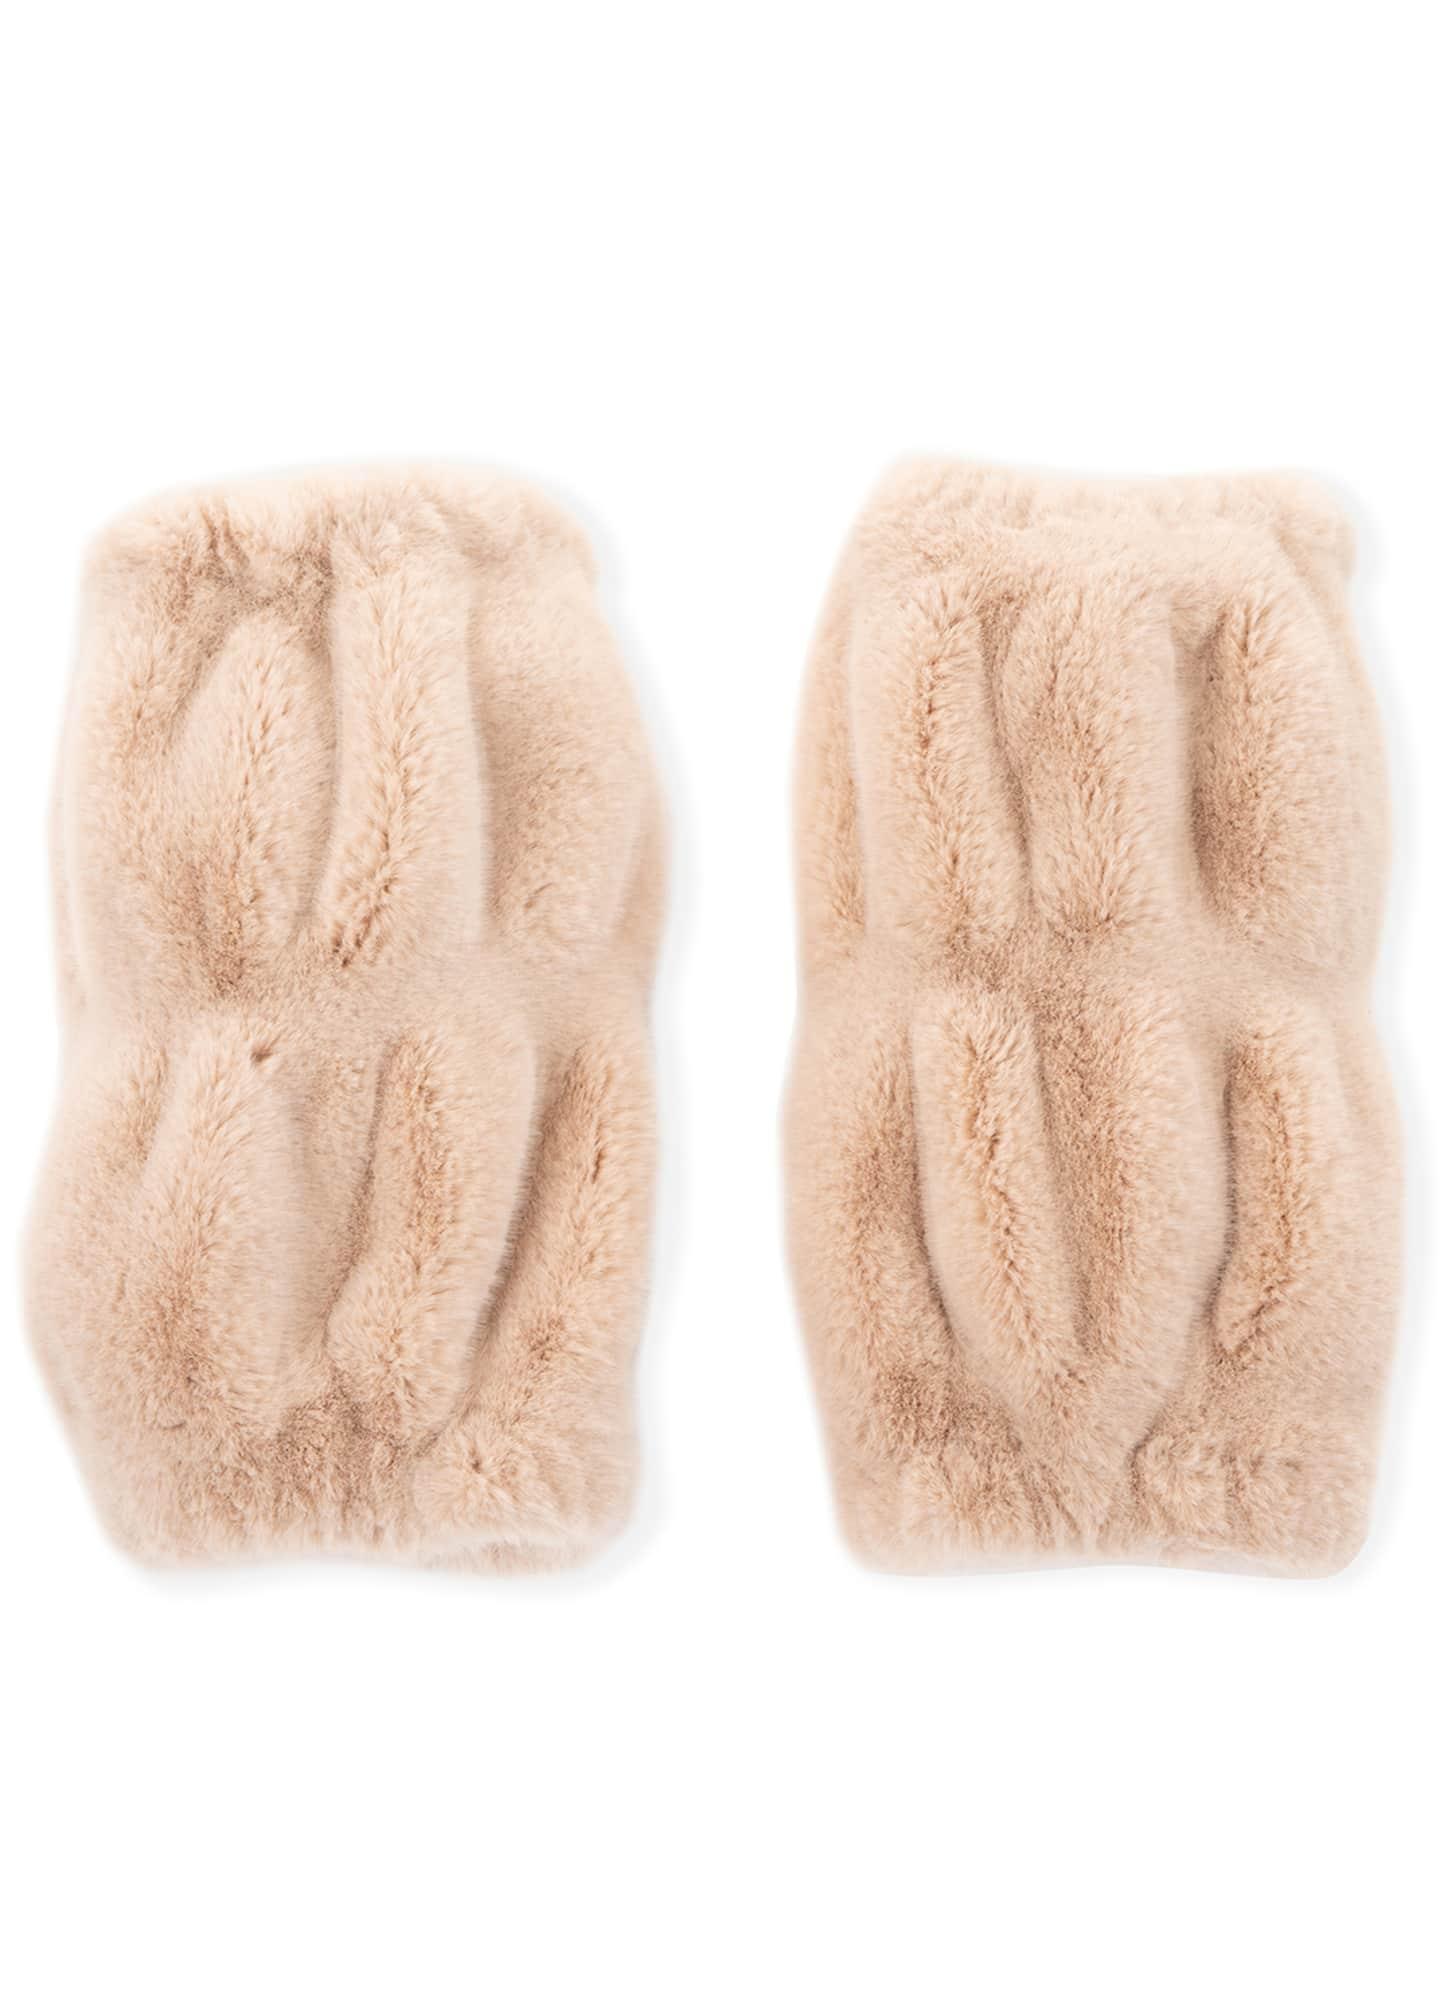 Fabulous Furs Kid's Couture Faux-Fur Leg Warmers